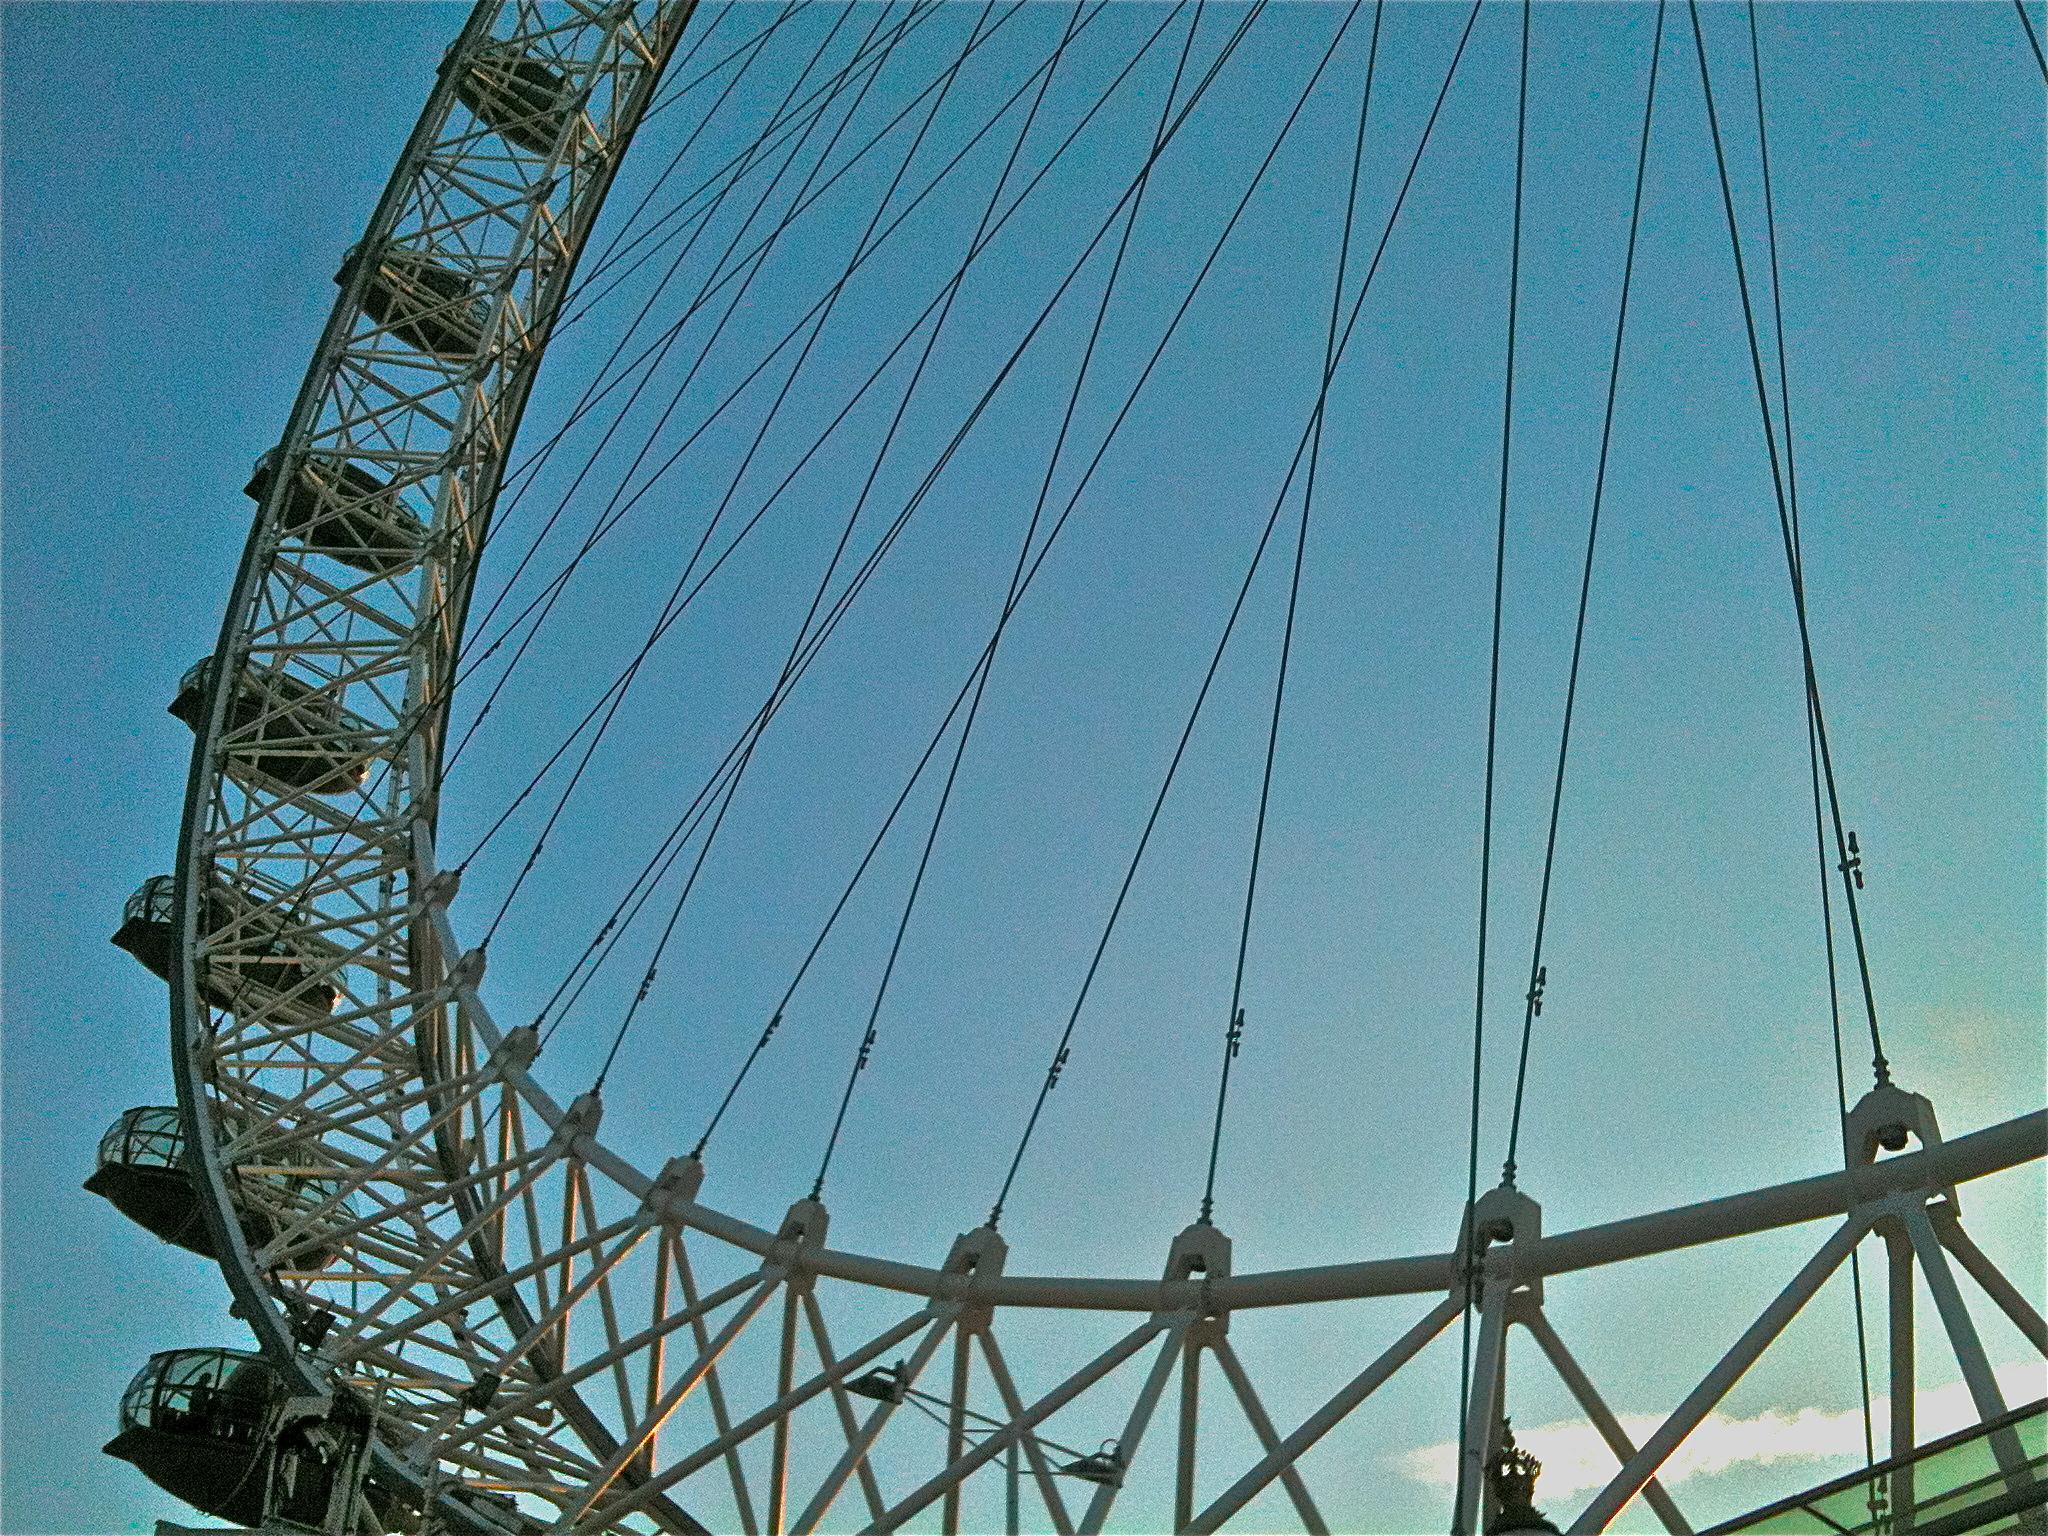 London Eye. Londra (UK), Settembre 2011